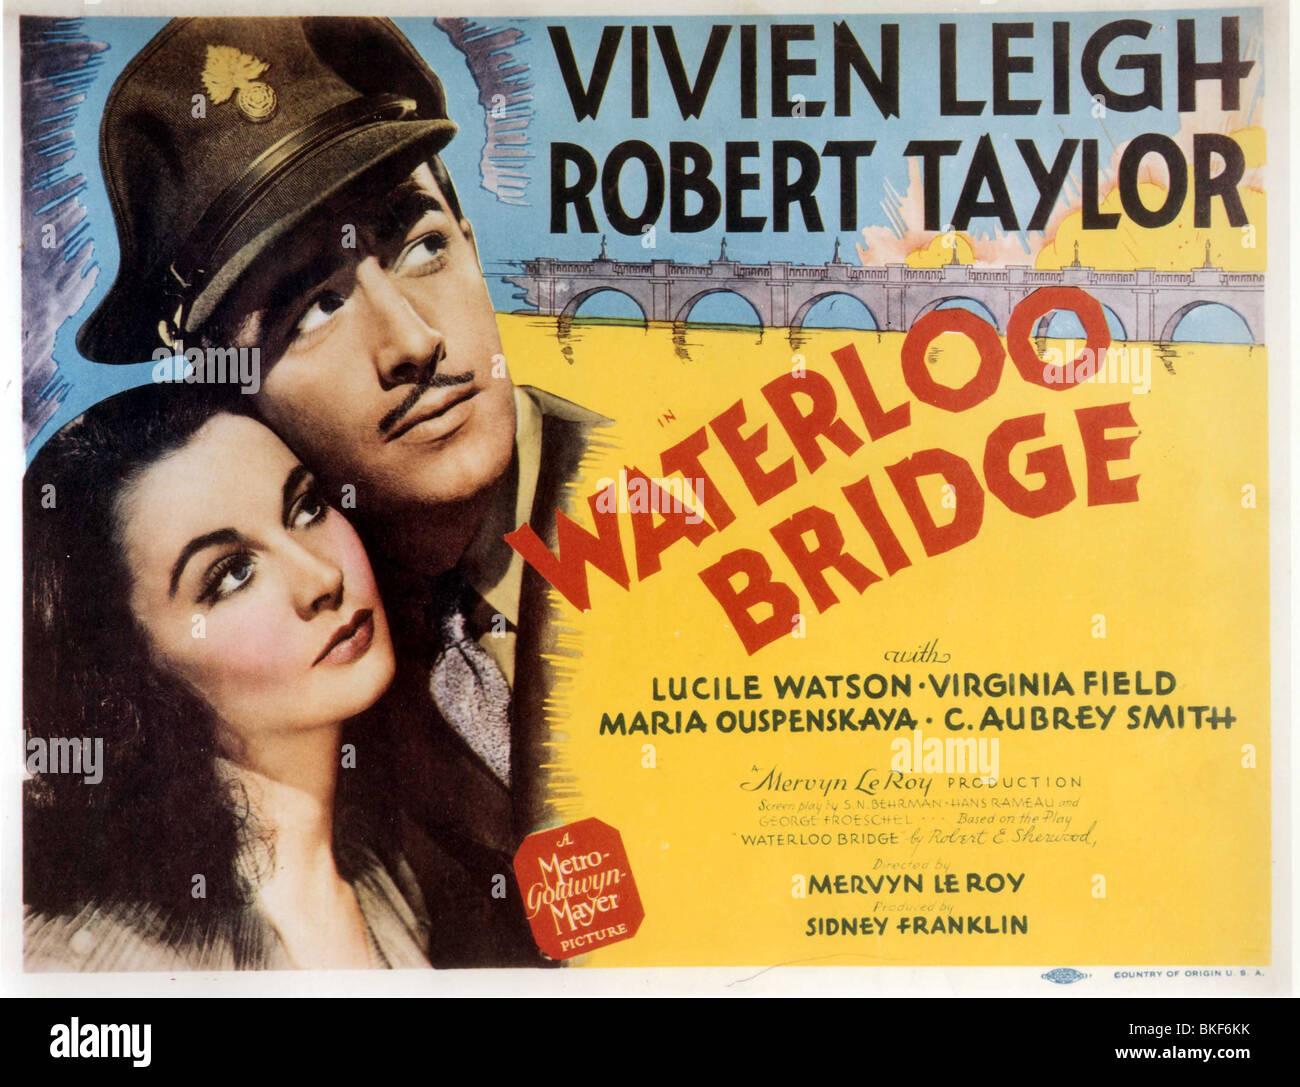 WATERLOO ROAD -1940 POSTER - Stock Image